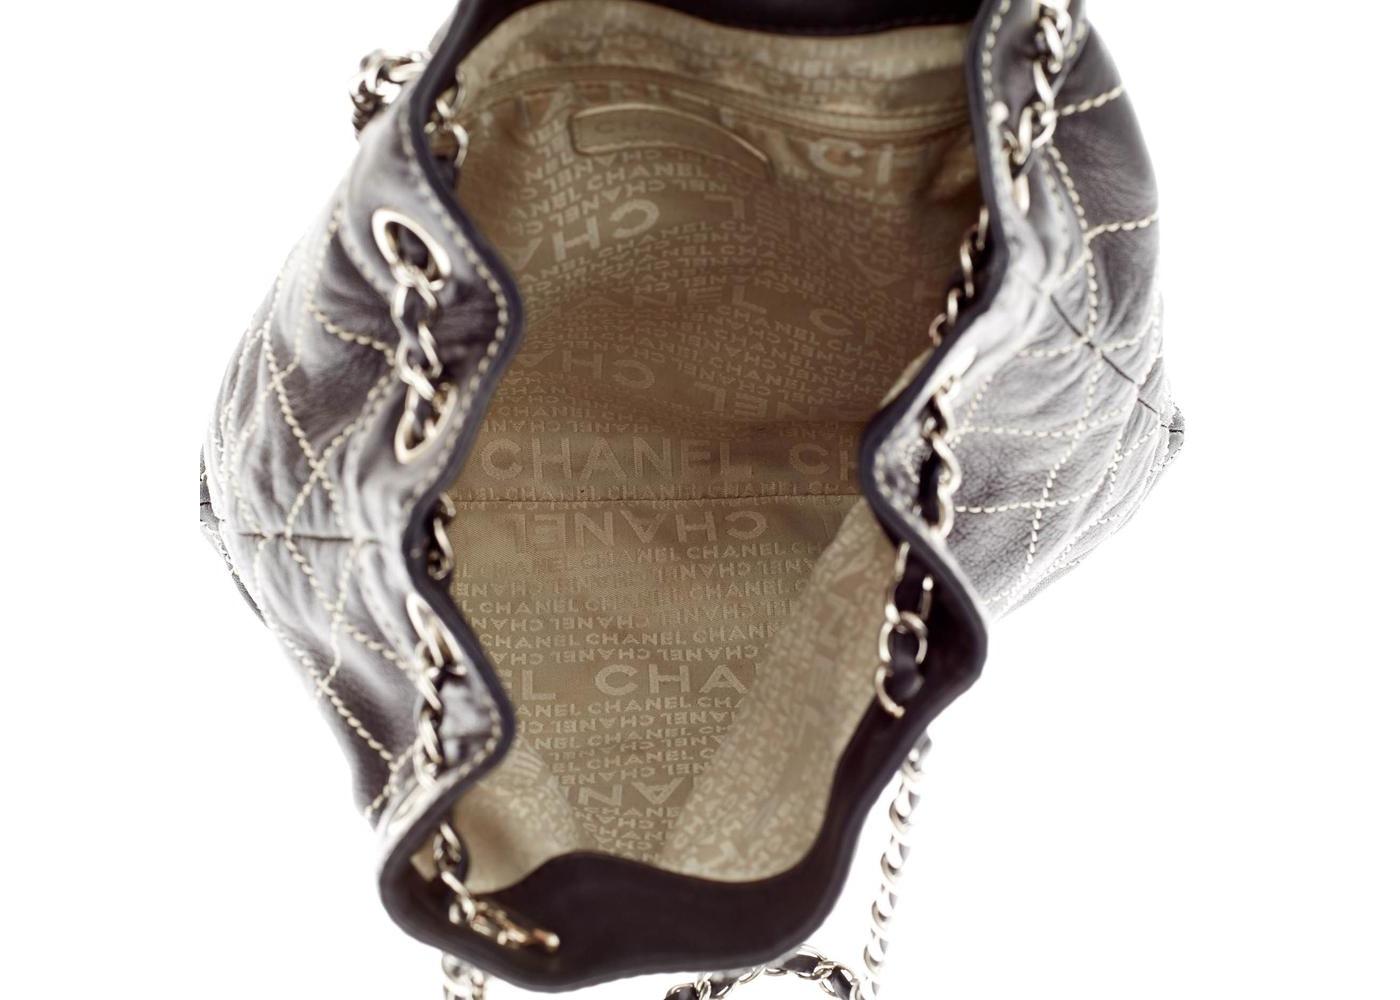 b1c55f4c45a2 Chanel Surpique Stitch Drawstring Bucket Quilted Diamond Large Black